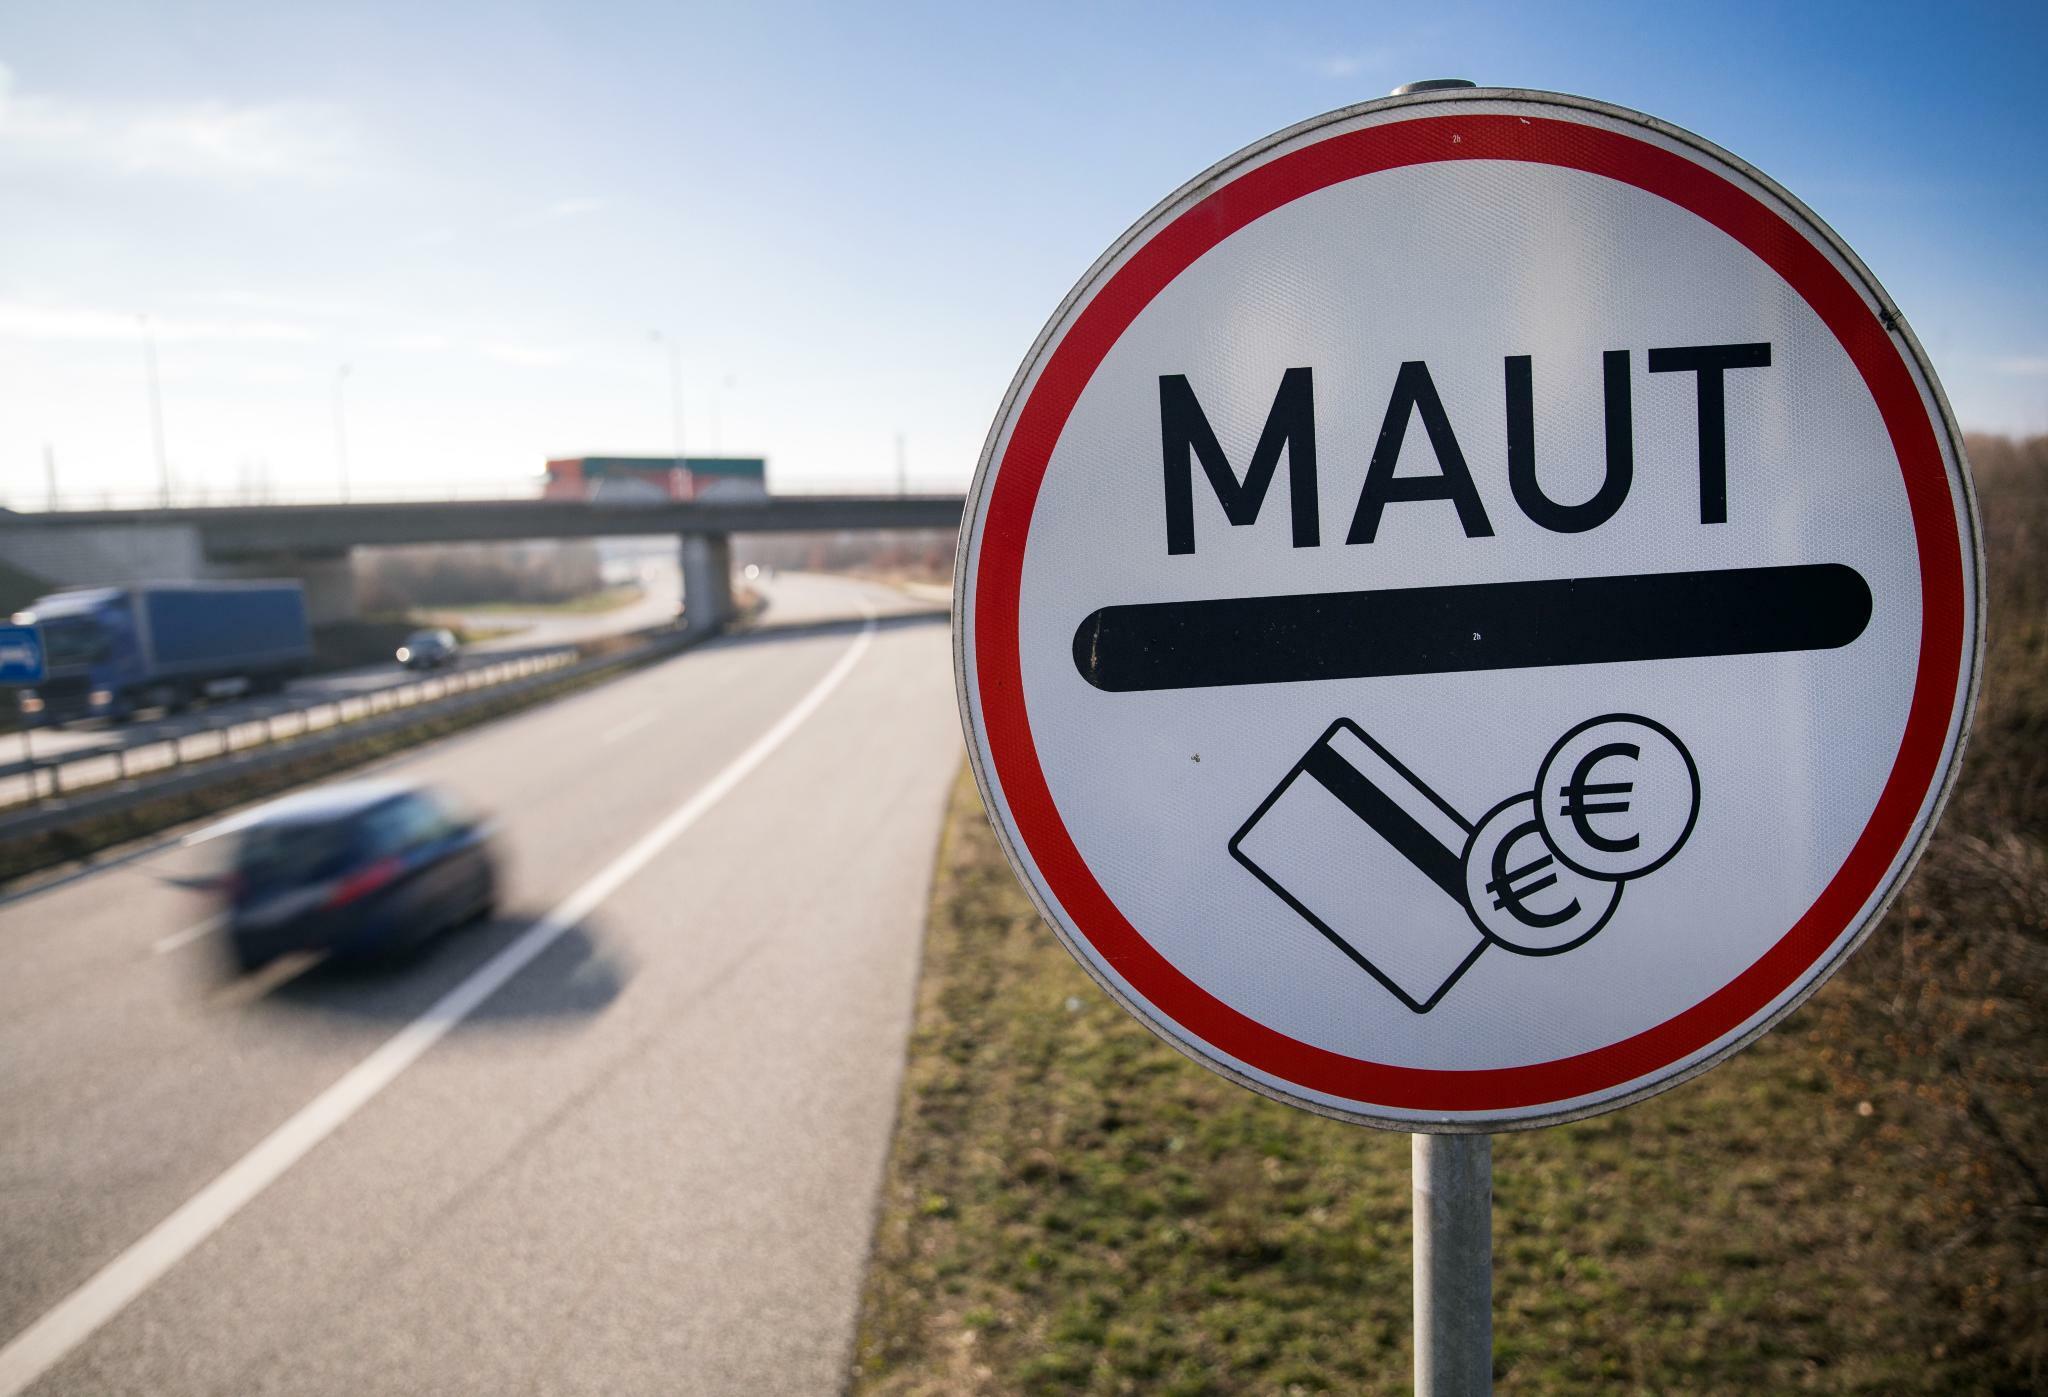 Pkw-Mau: Untersuchungsausschuss verzögert sich